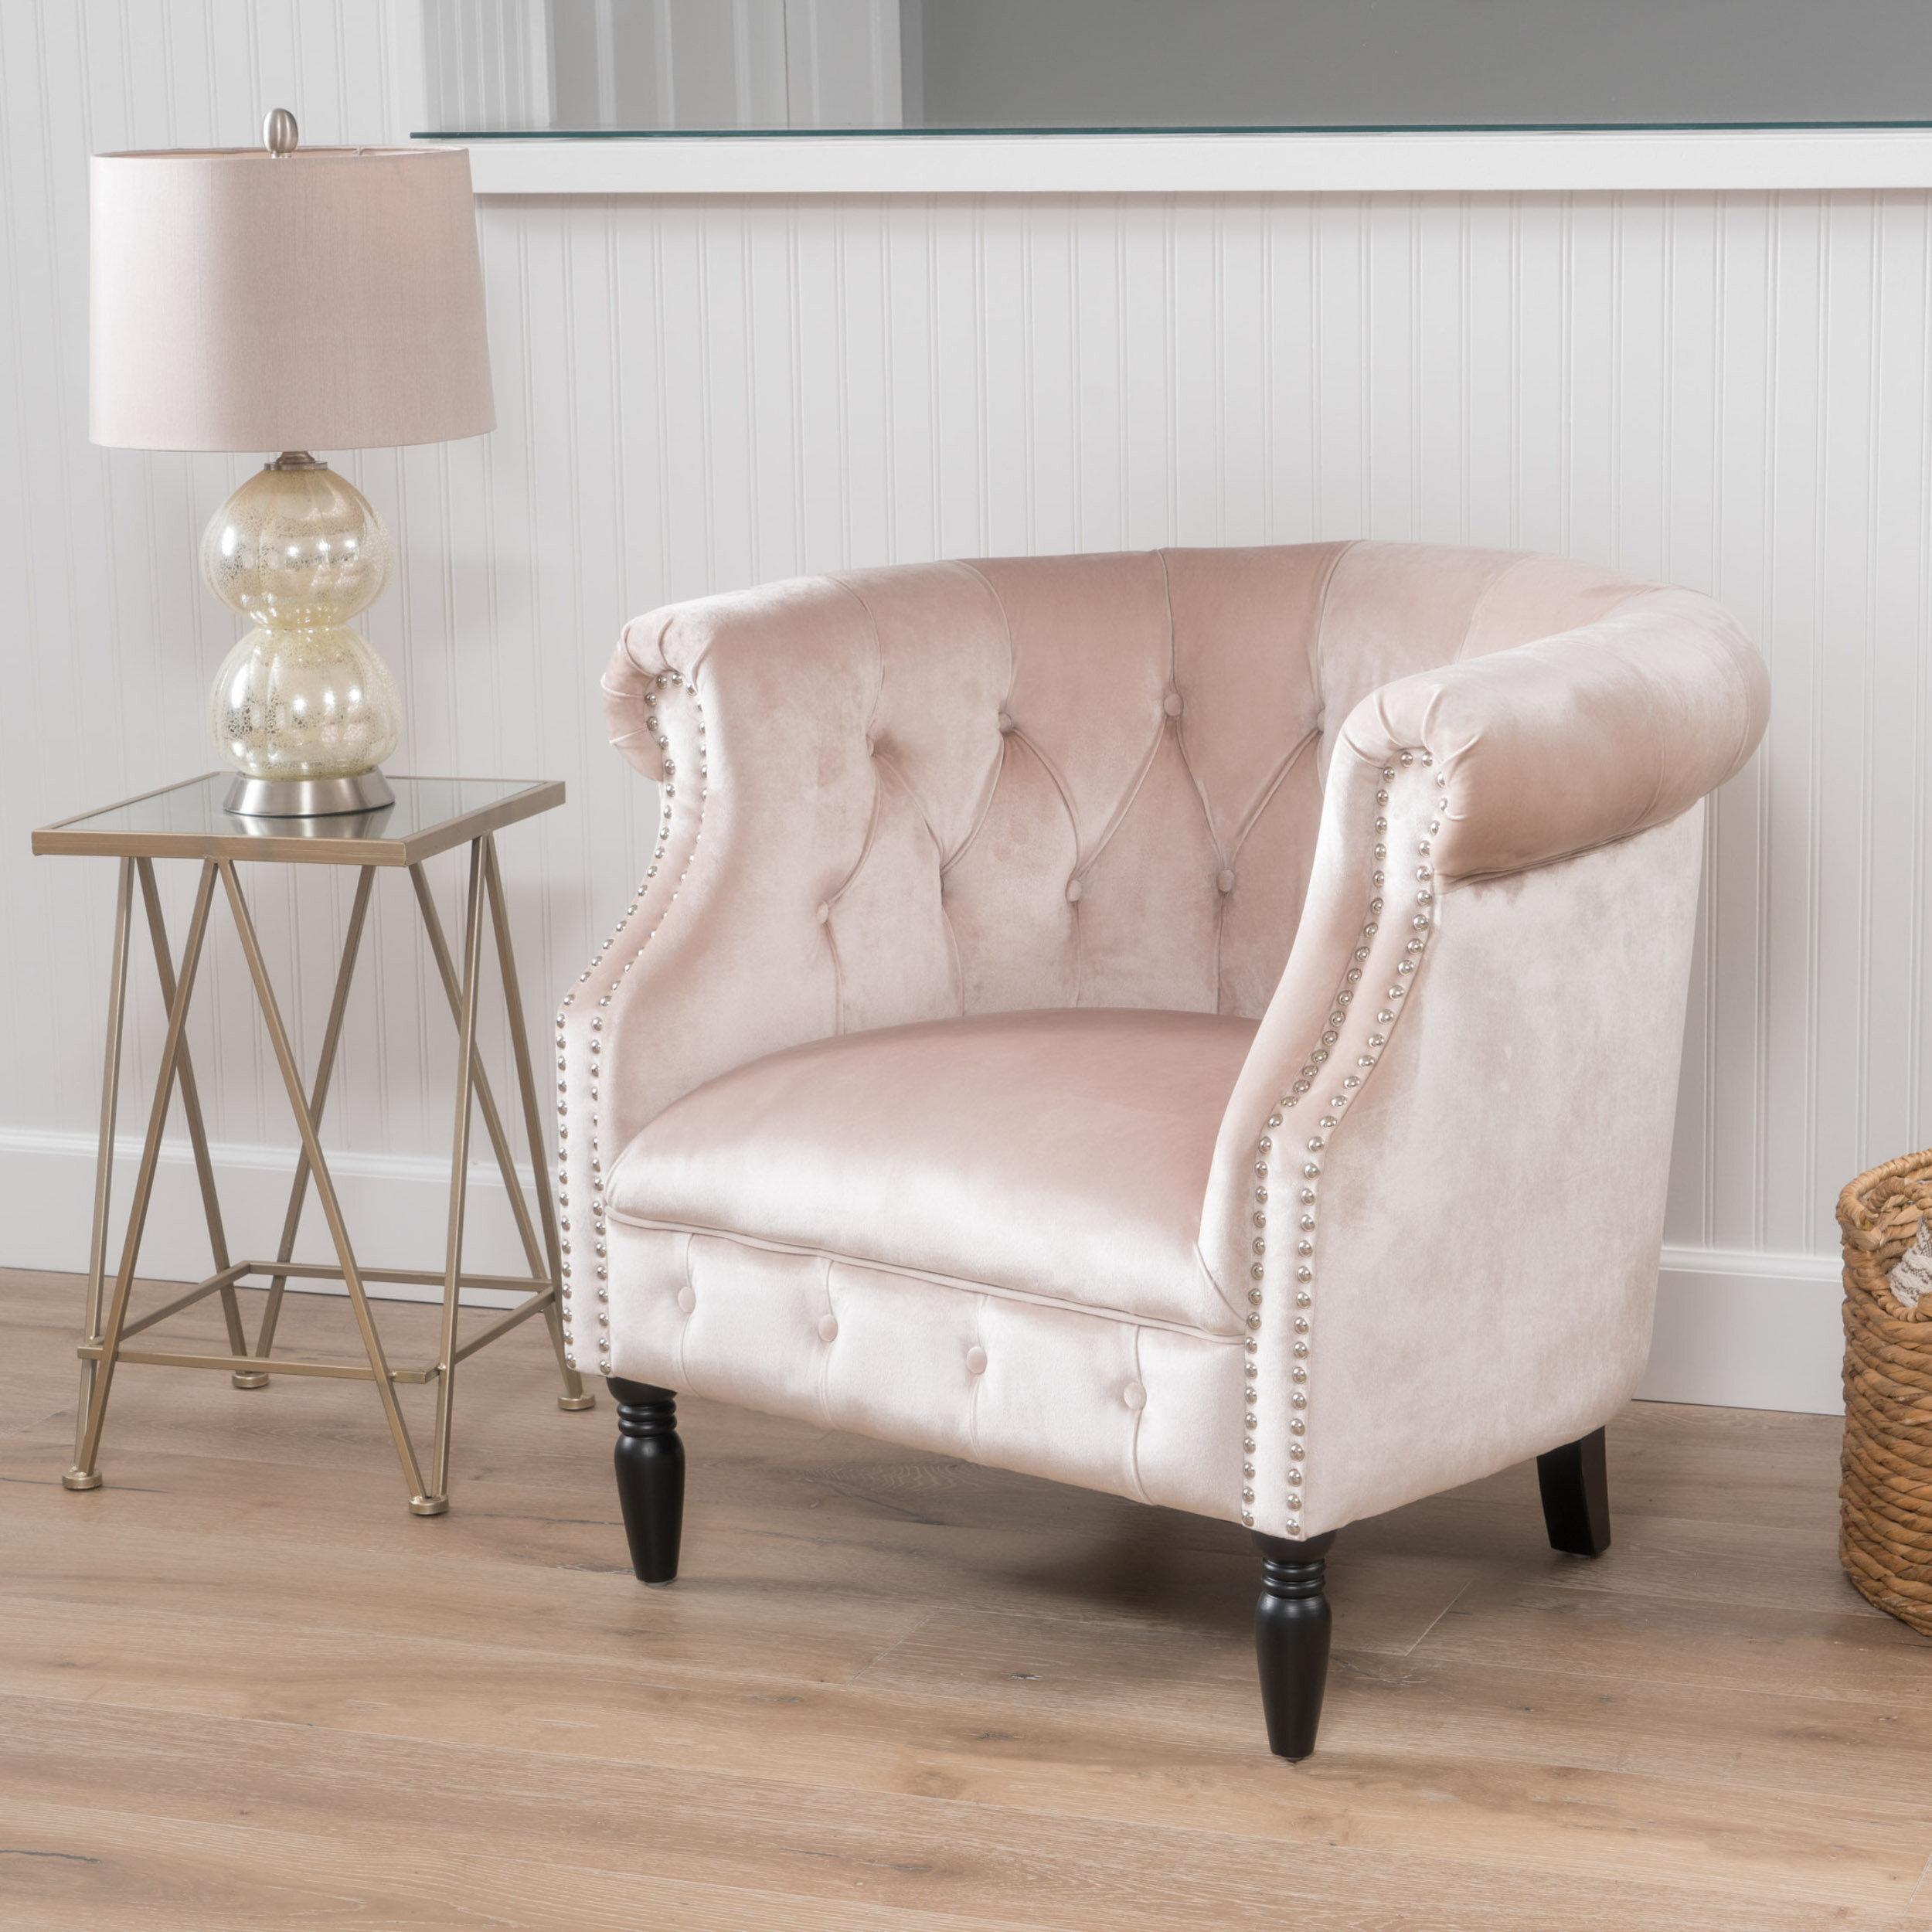 jackson sofa main chair joss furniture pdp chesterfield reviews